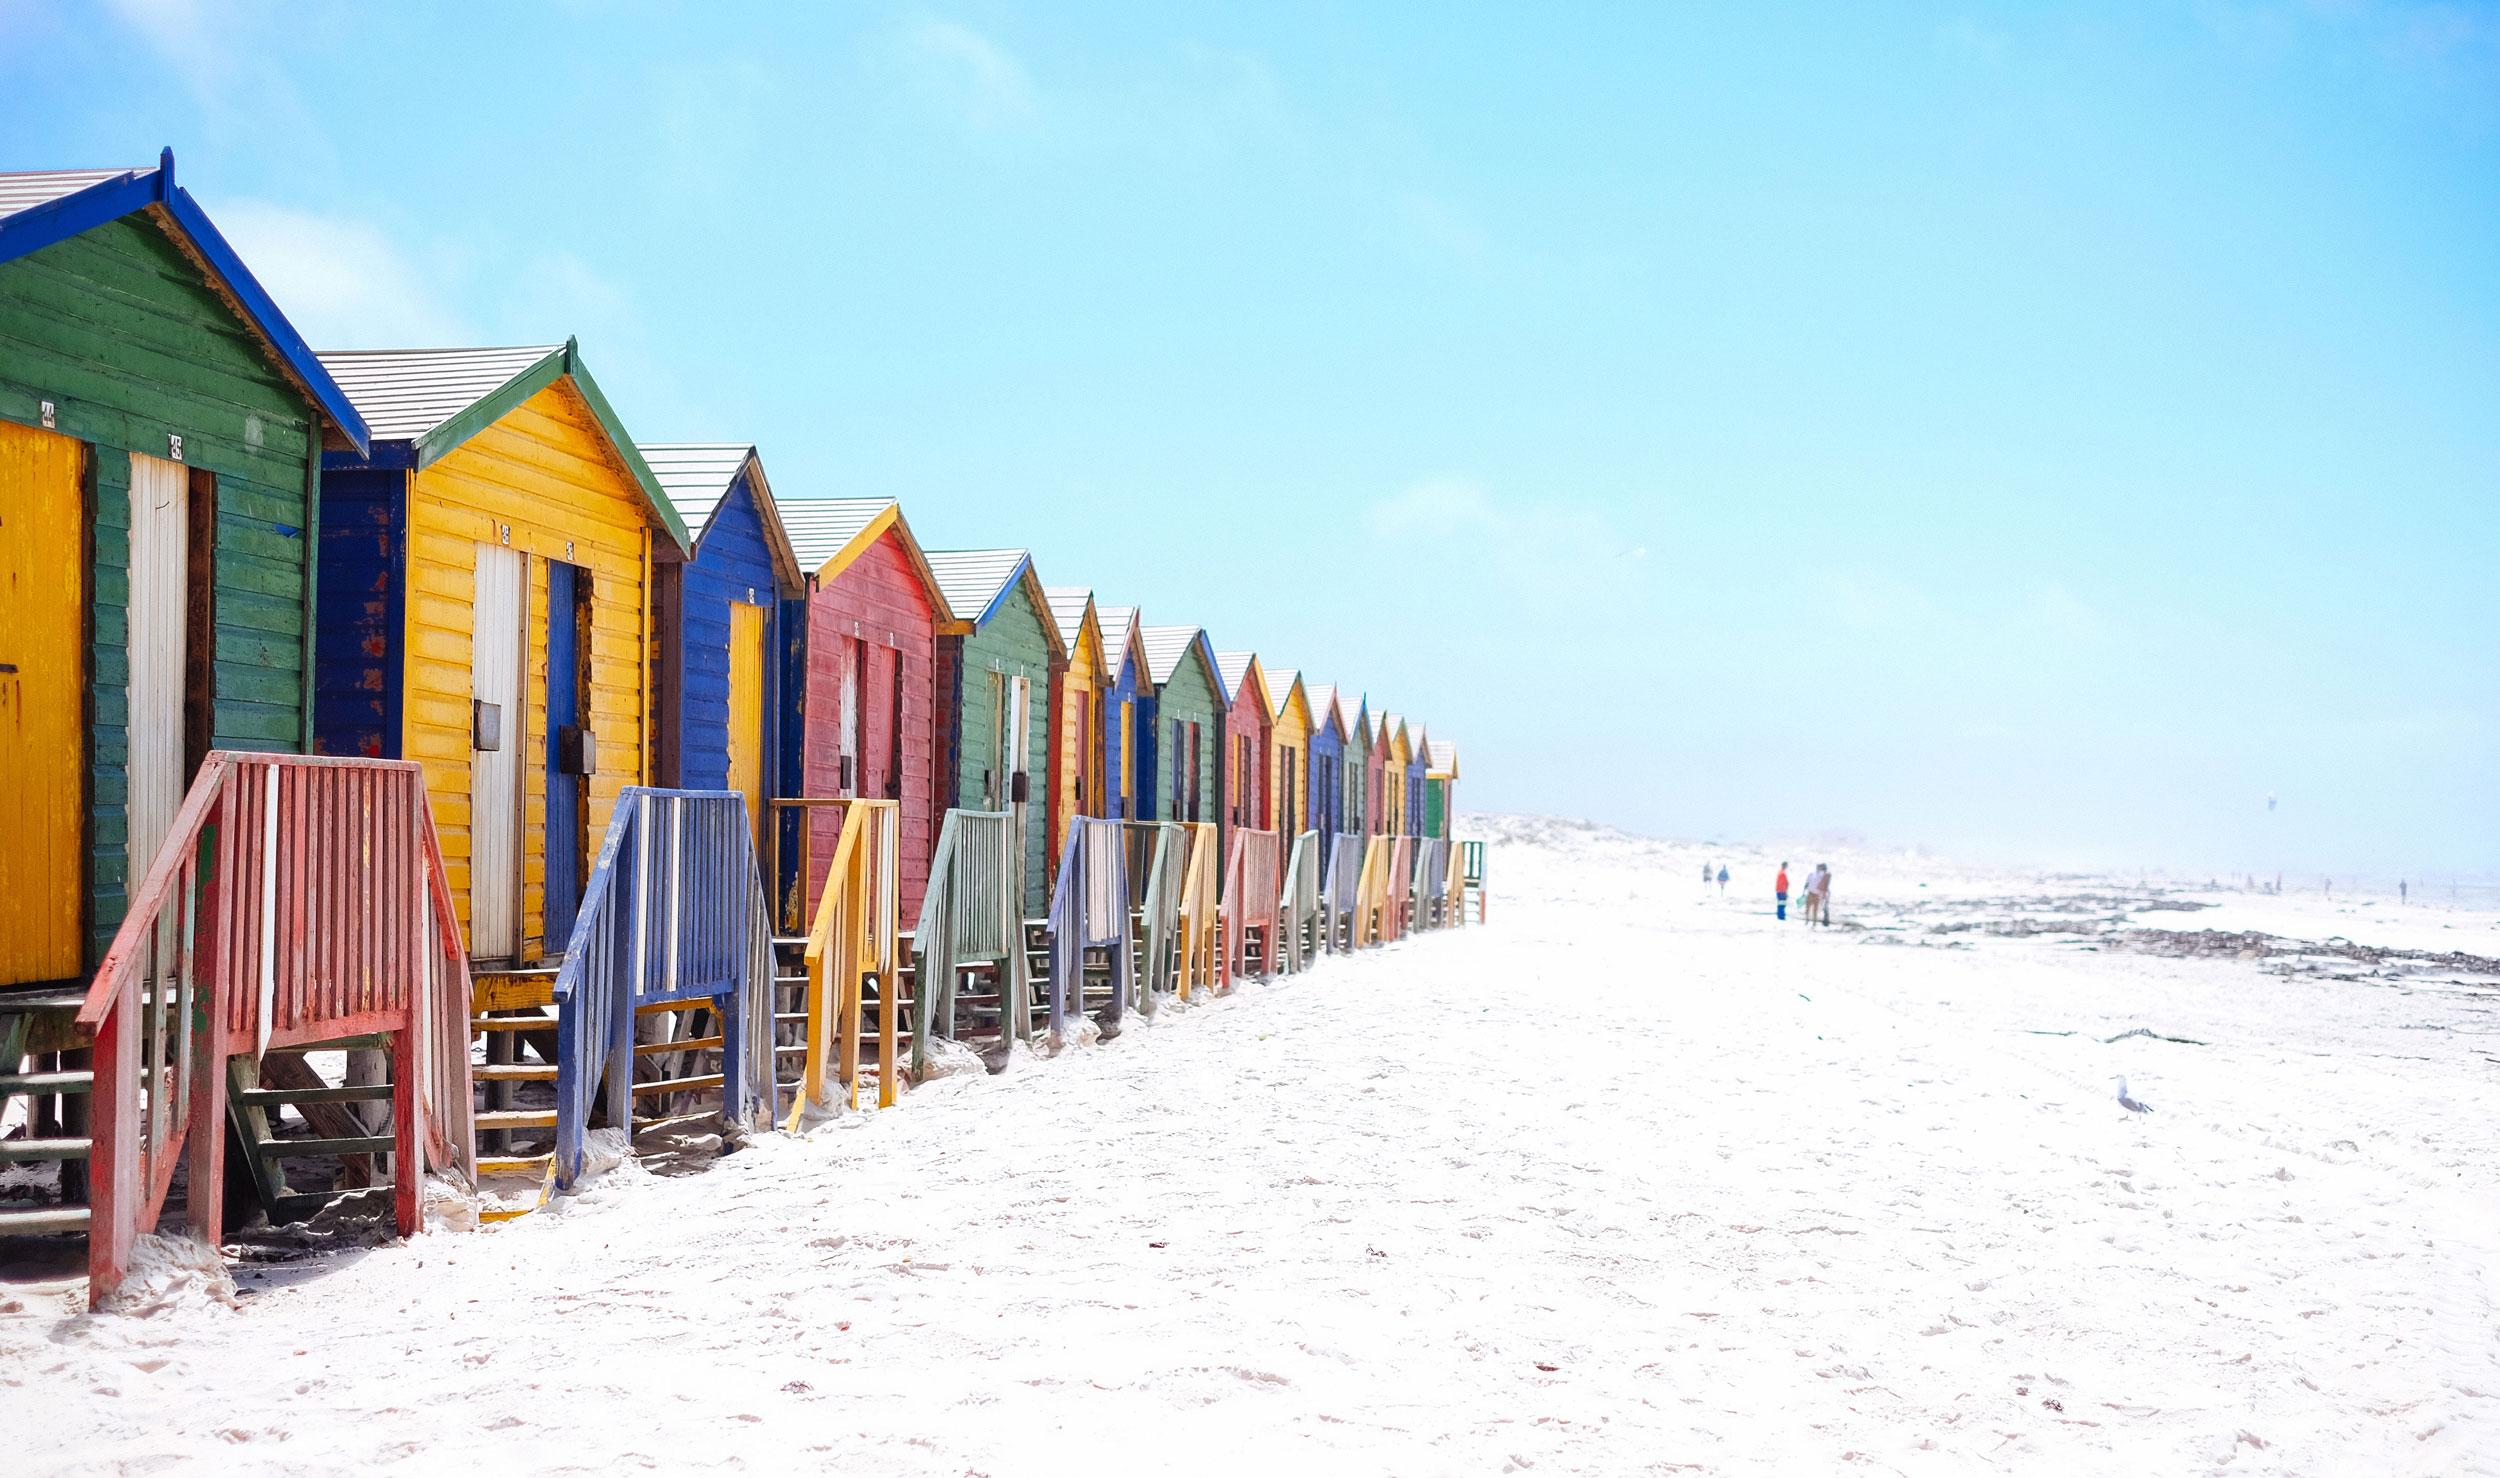 17 Instagram-worthy Spots in South Africa